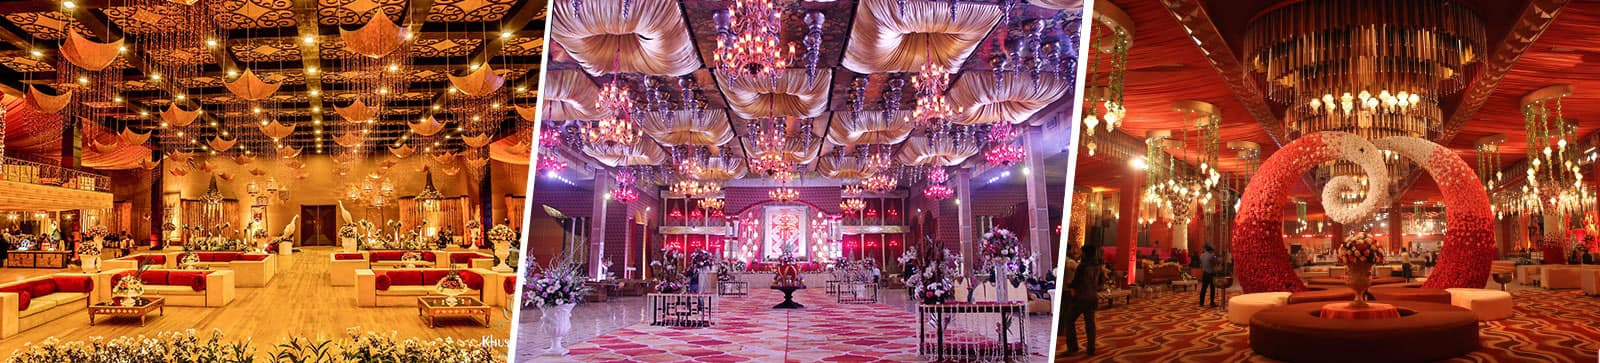 wedding venues on nh8